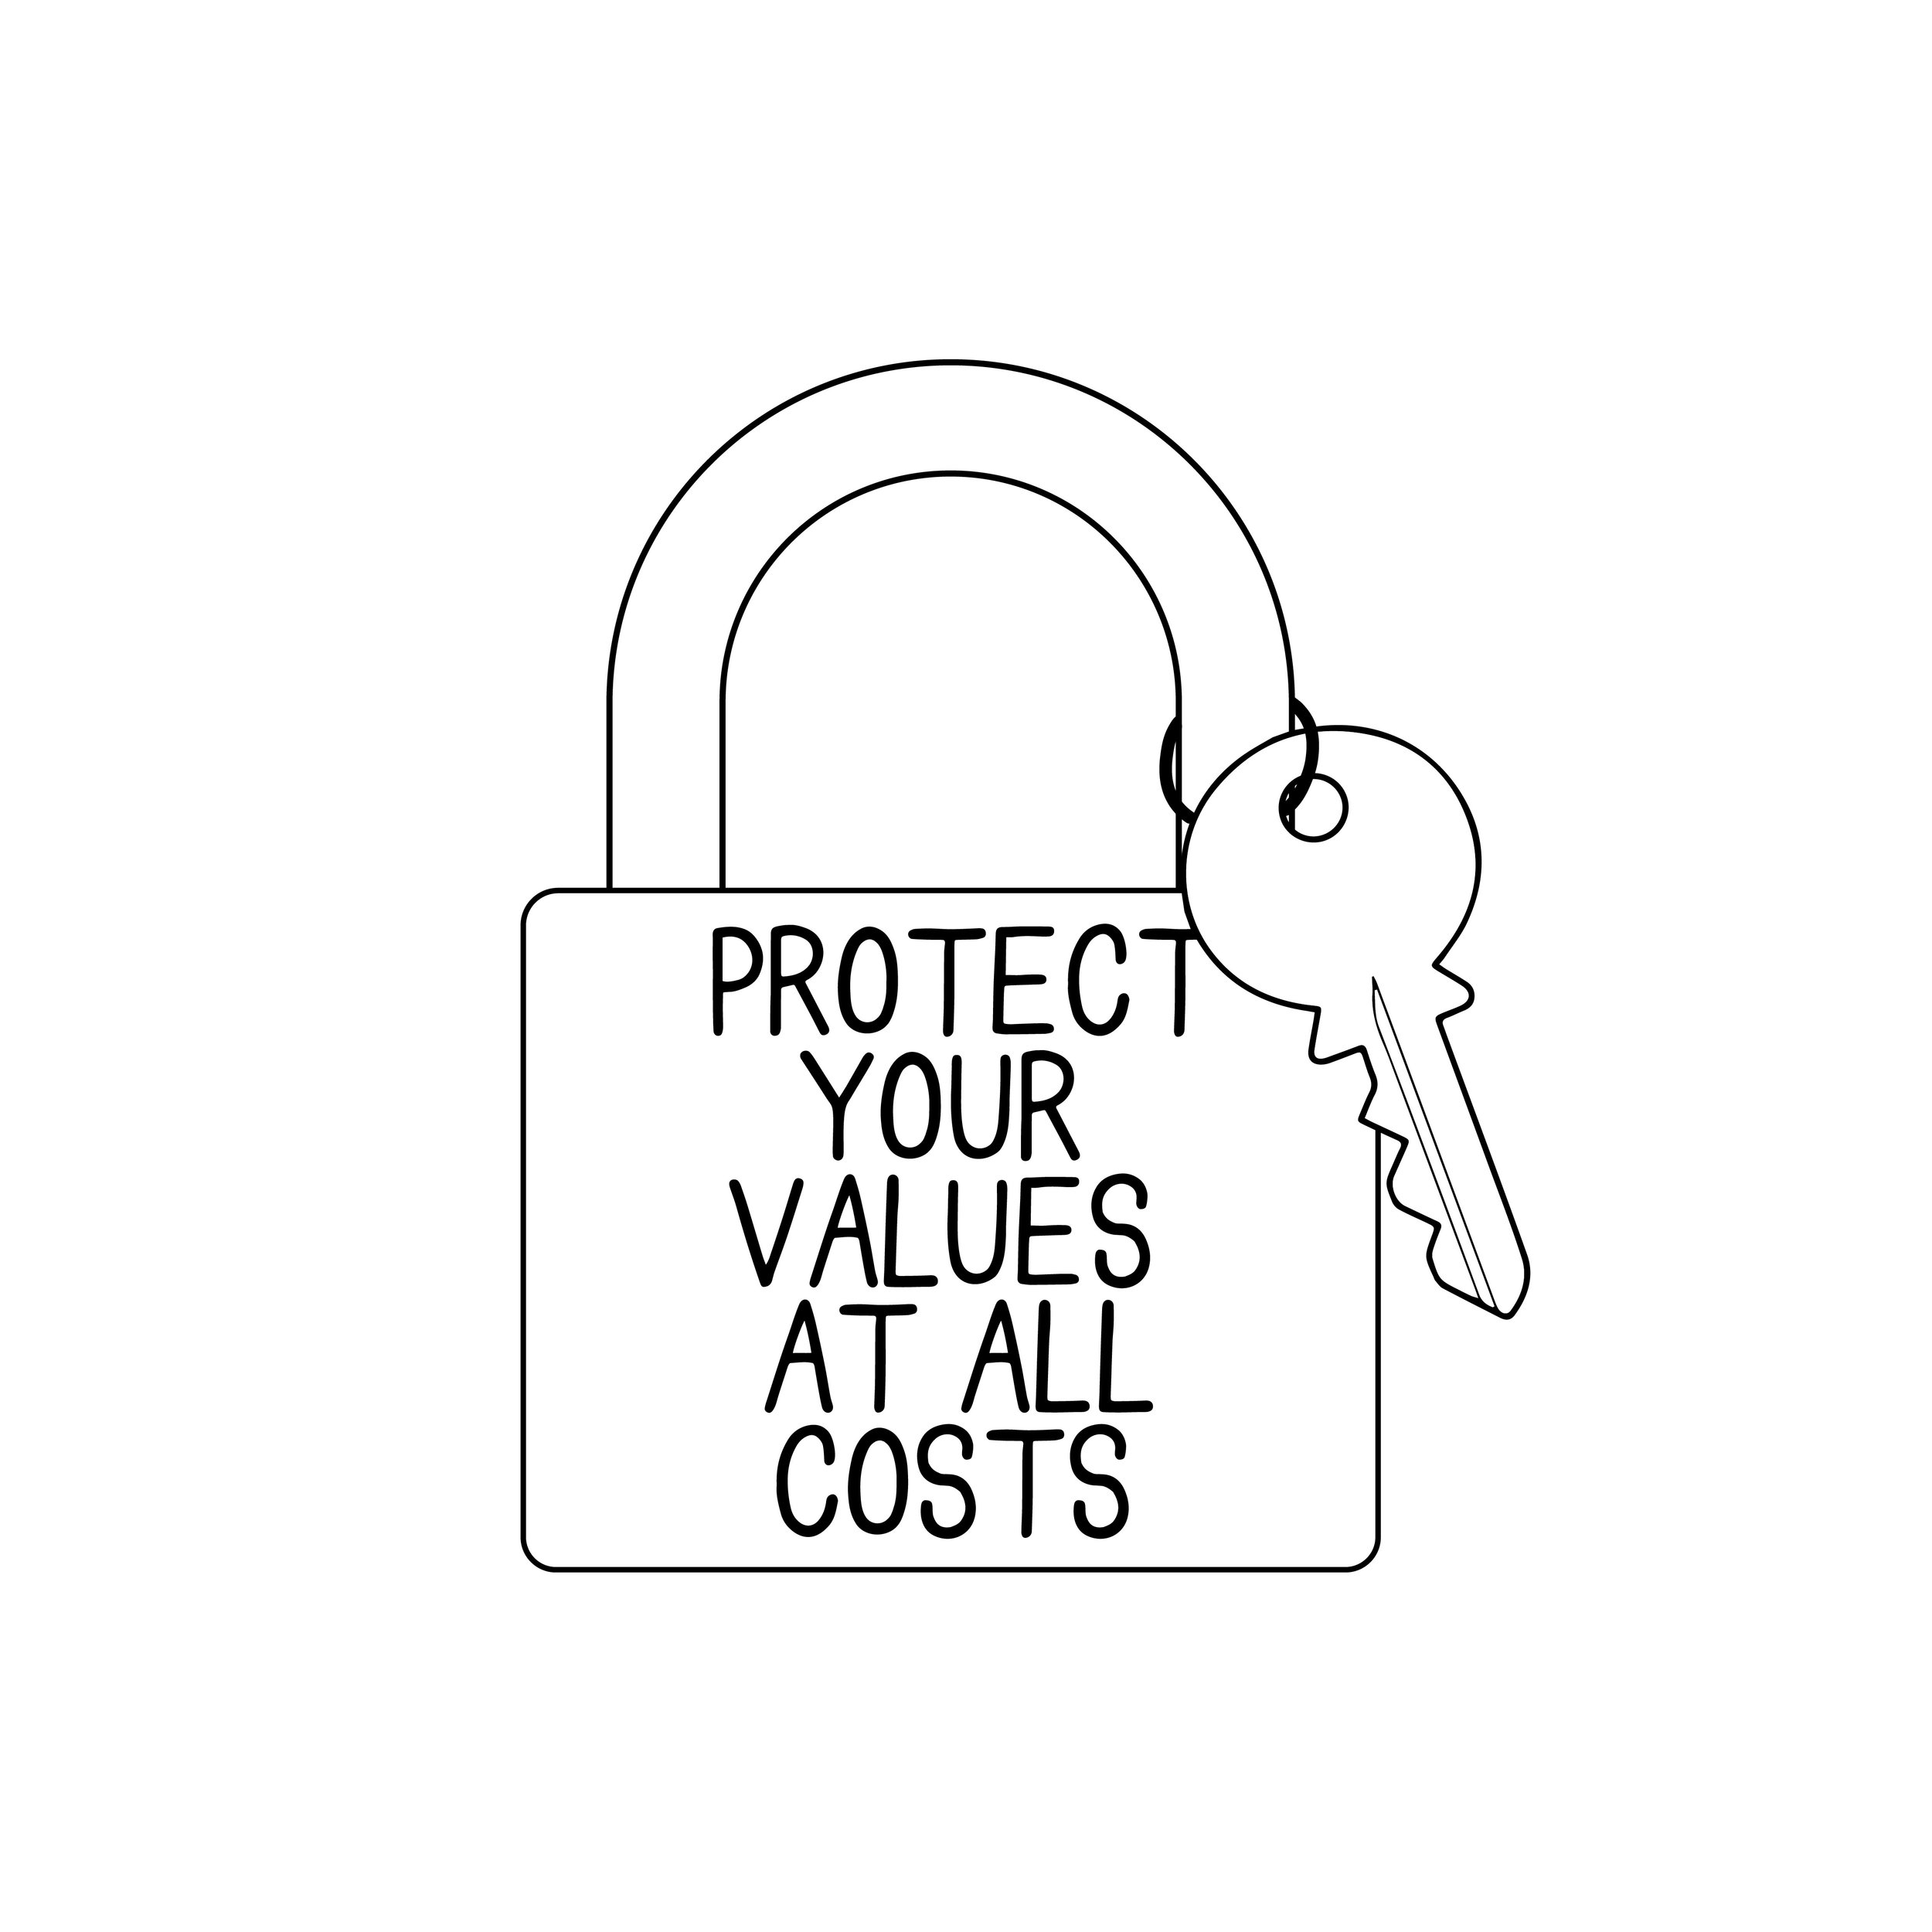 protectyourvalues-01.jpg